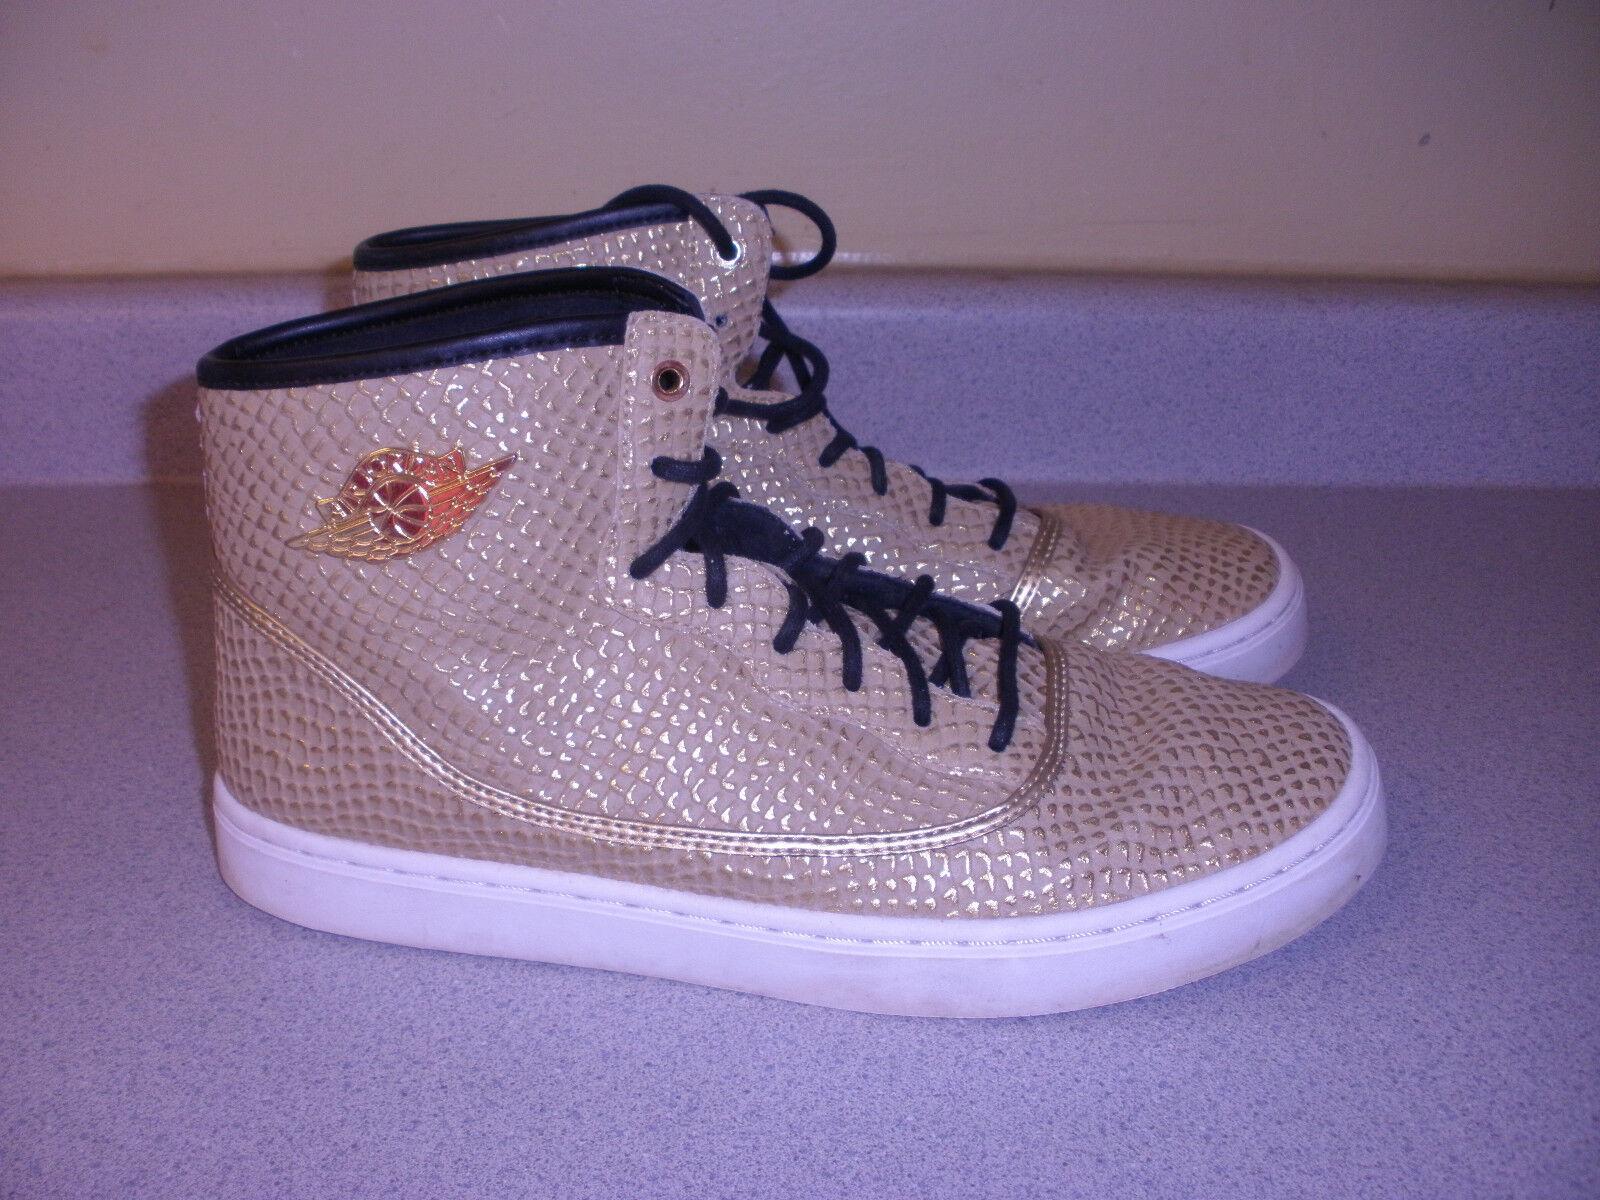 Women's NIKE Jasmine GG Metallic gold Court shoes Size 9